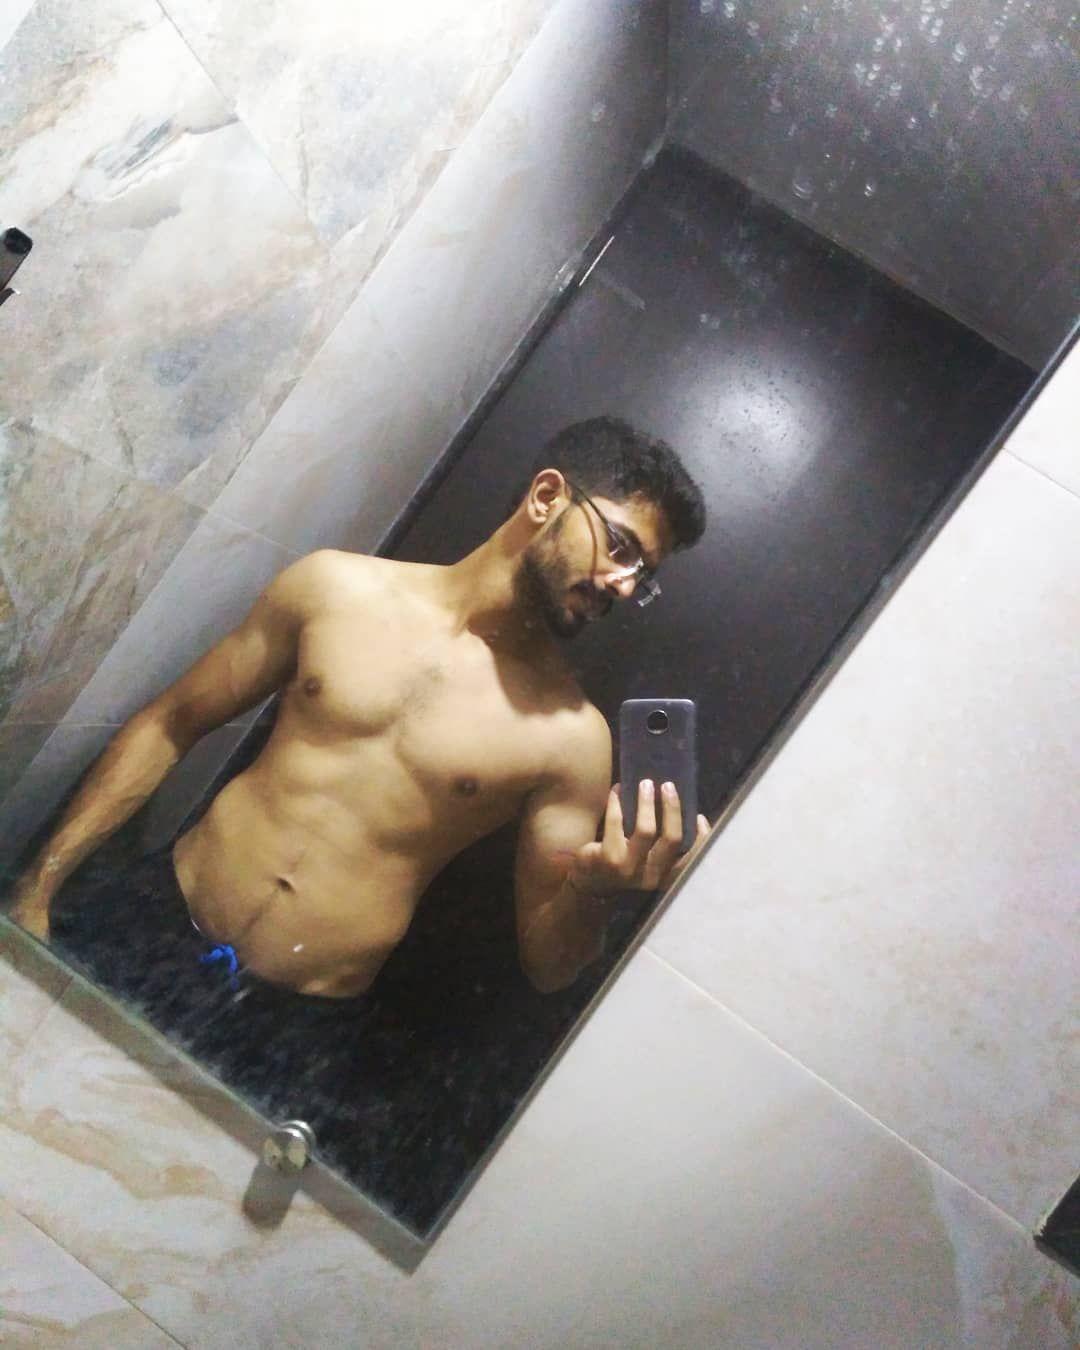 #nightmare ❤️ . . . . ... . . #body #indianbody #fitnessaddict #fitnesschallenge #fitnessmodel #fitn...